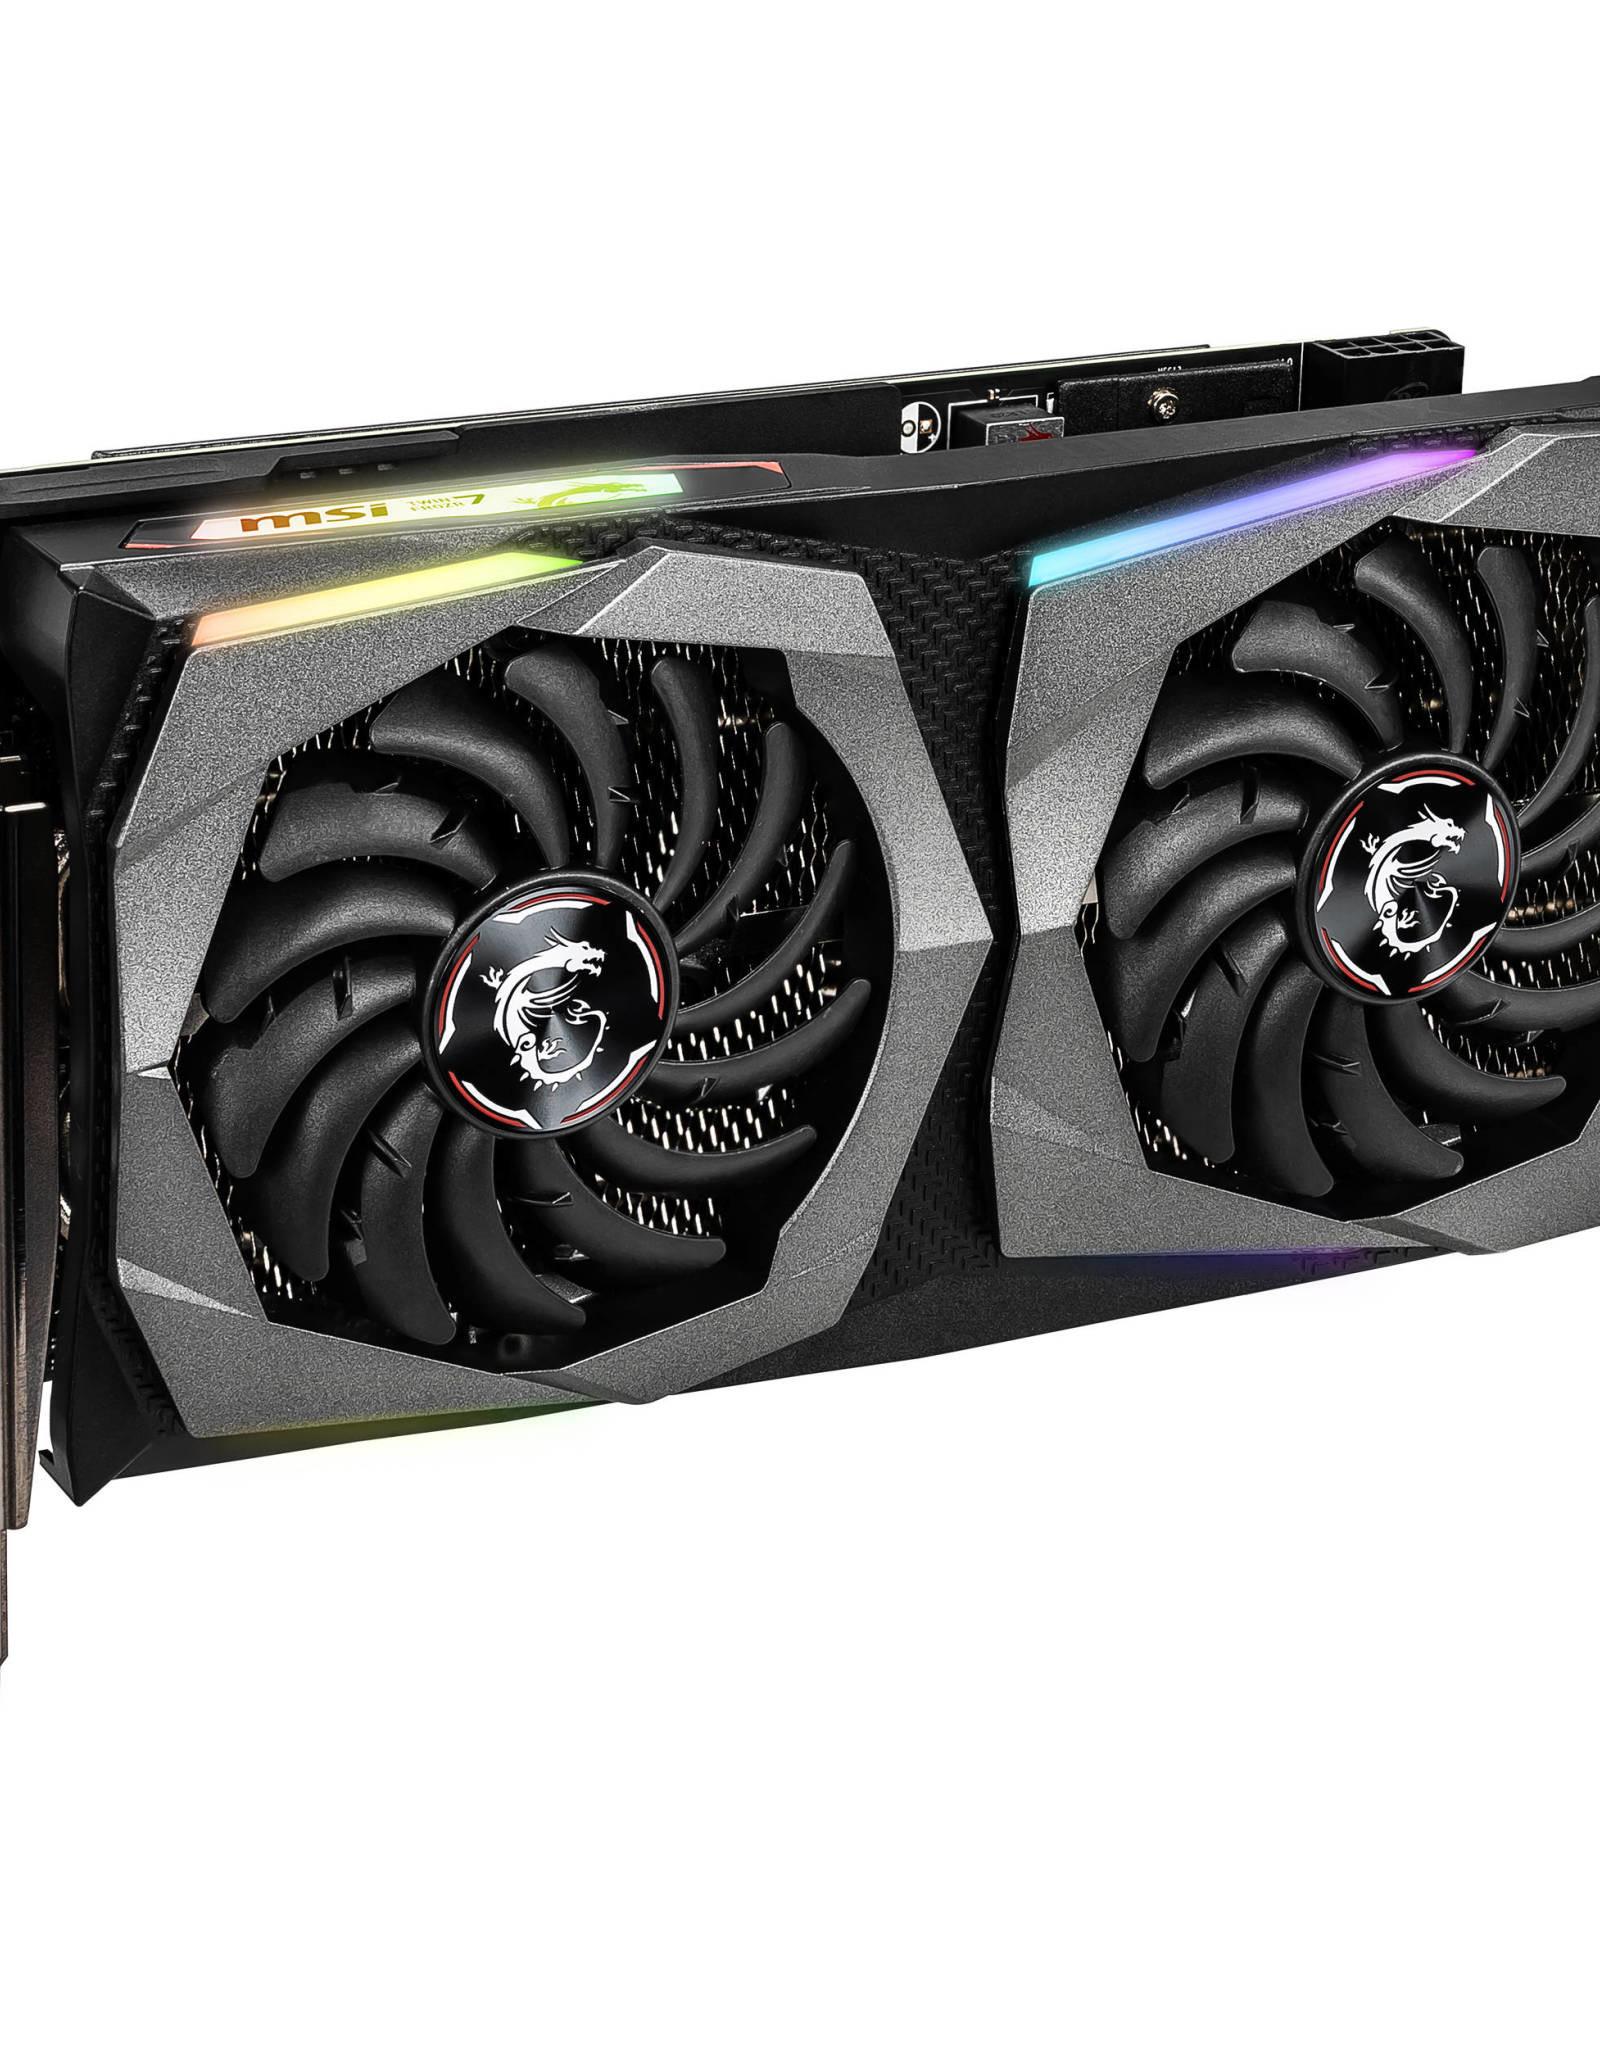 MSI | VCX GeForce RTX 2060 GAMING Z 6G 6G PCIE DPx3 HDMI ATX TF VII FAN G2060GZ6